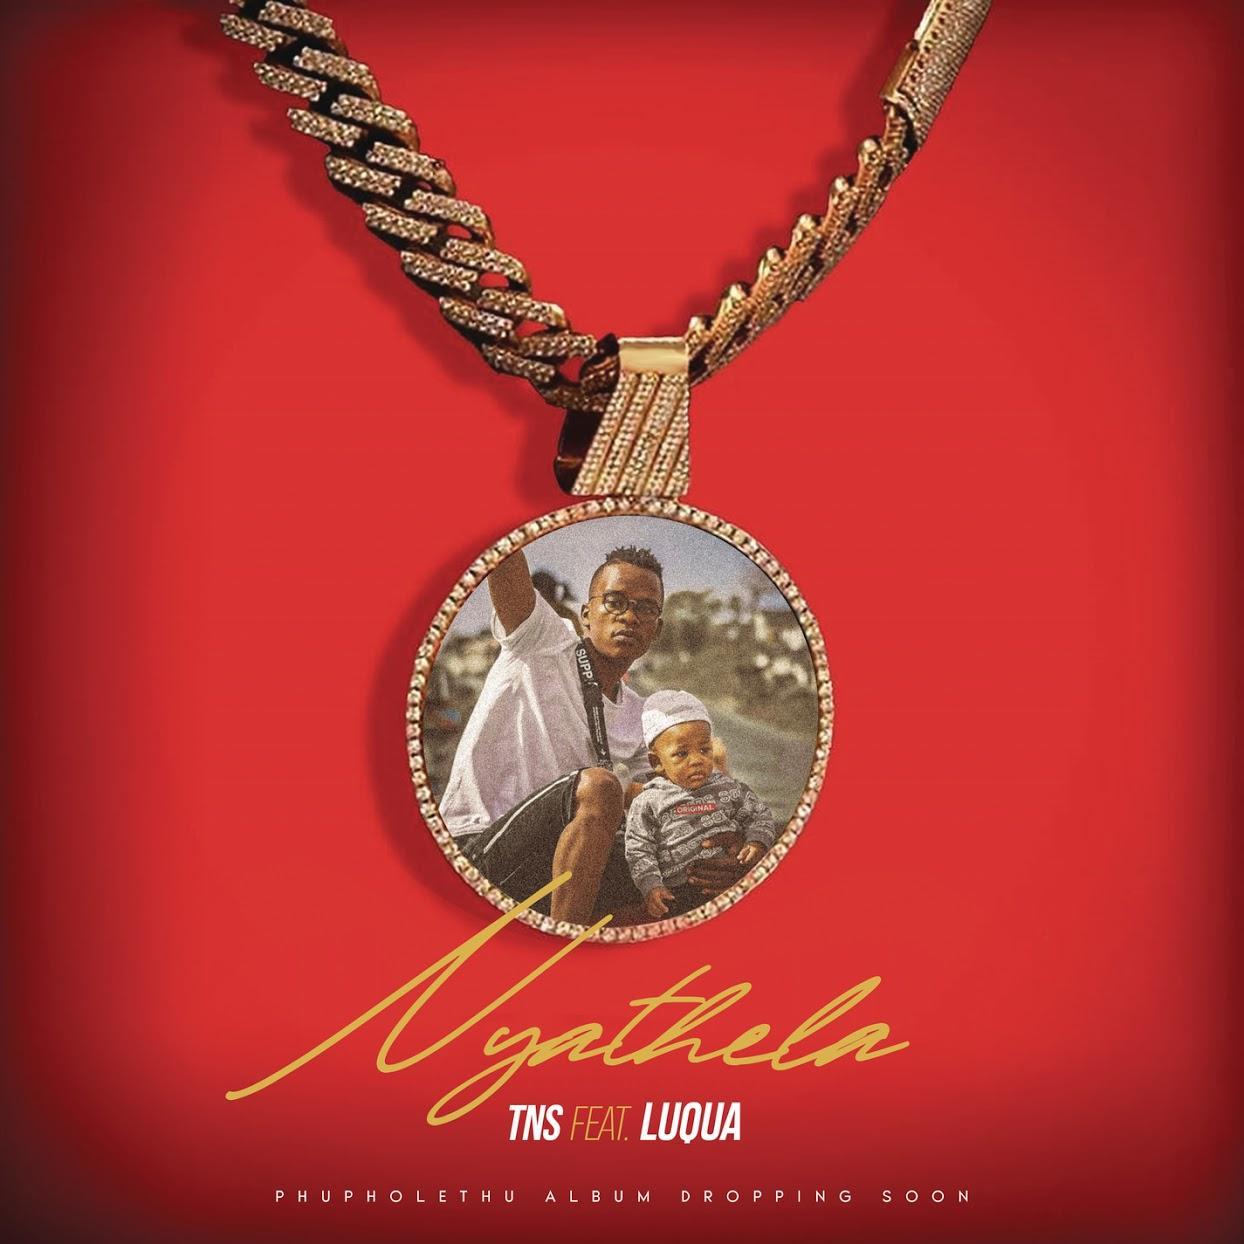 TNS - Nyathela ft. Luqua